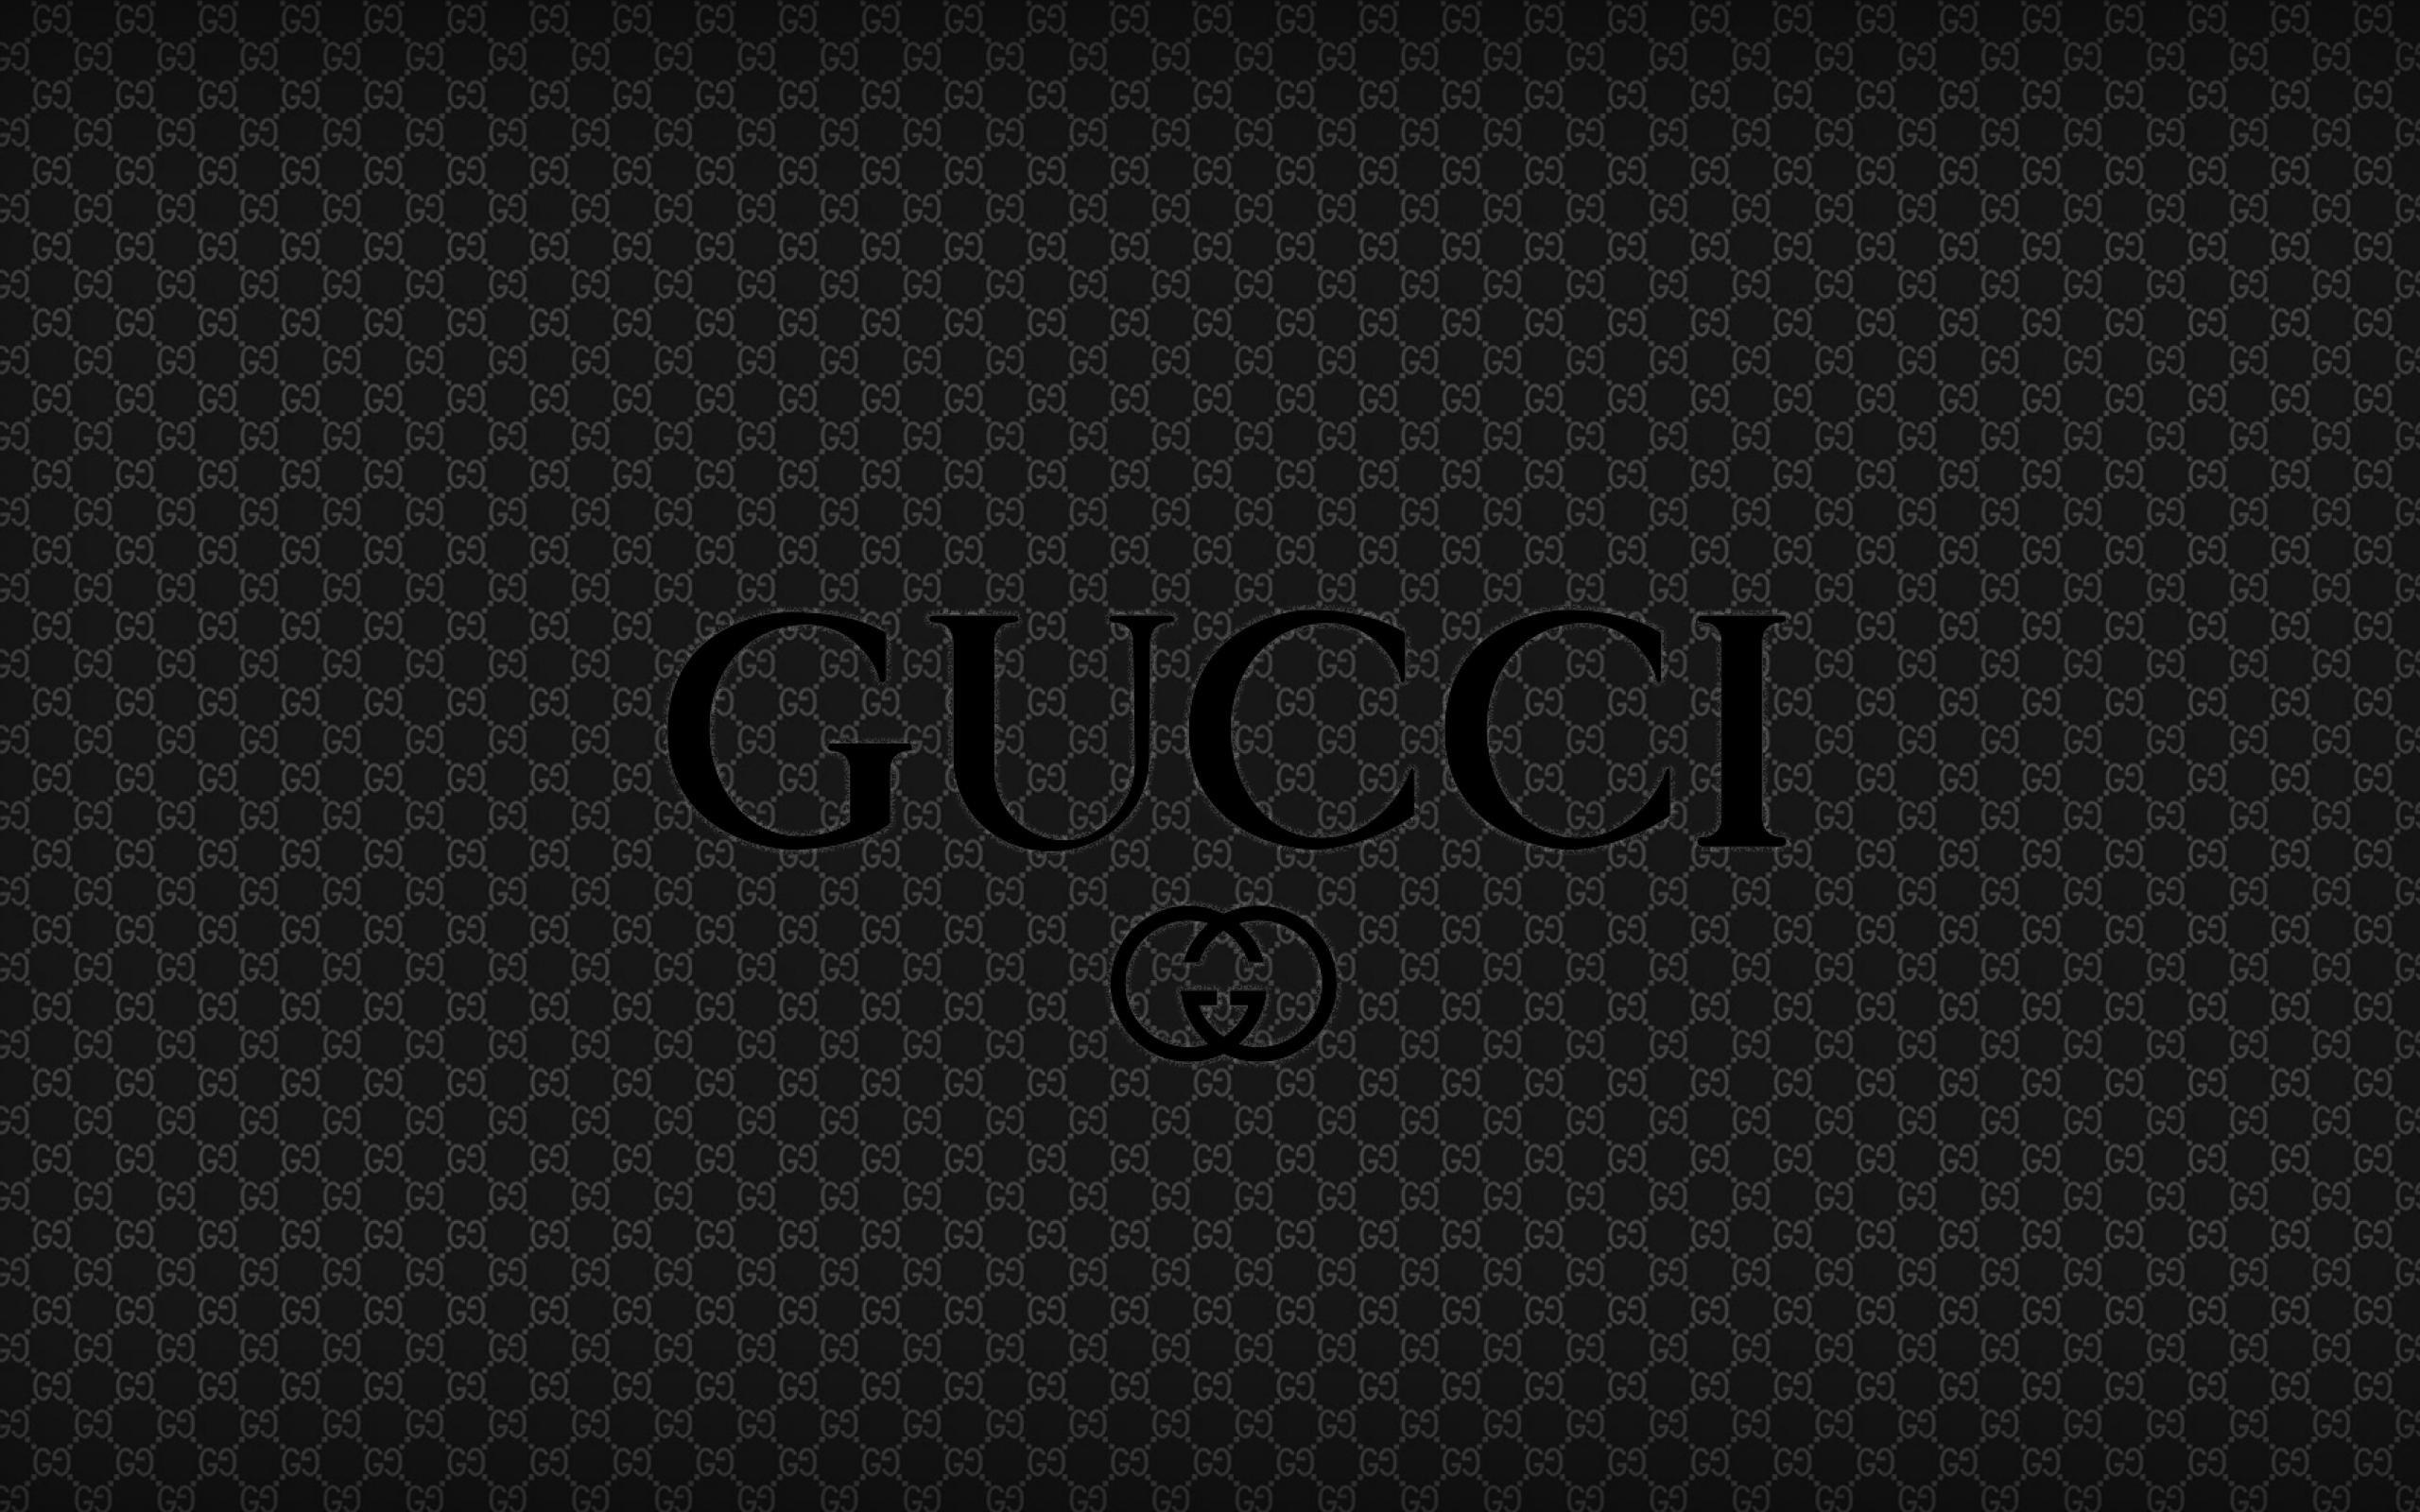 … gucci wallpapers hd pixelstalk net …